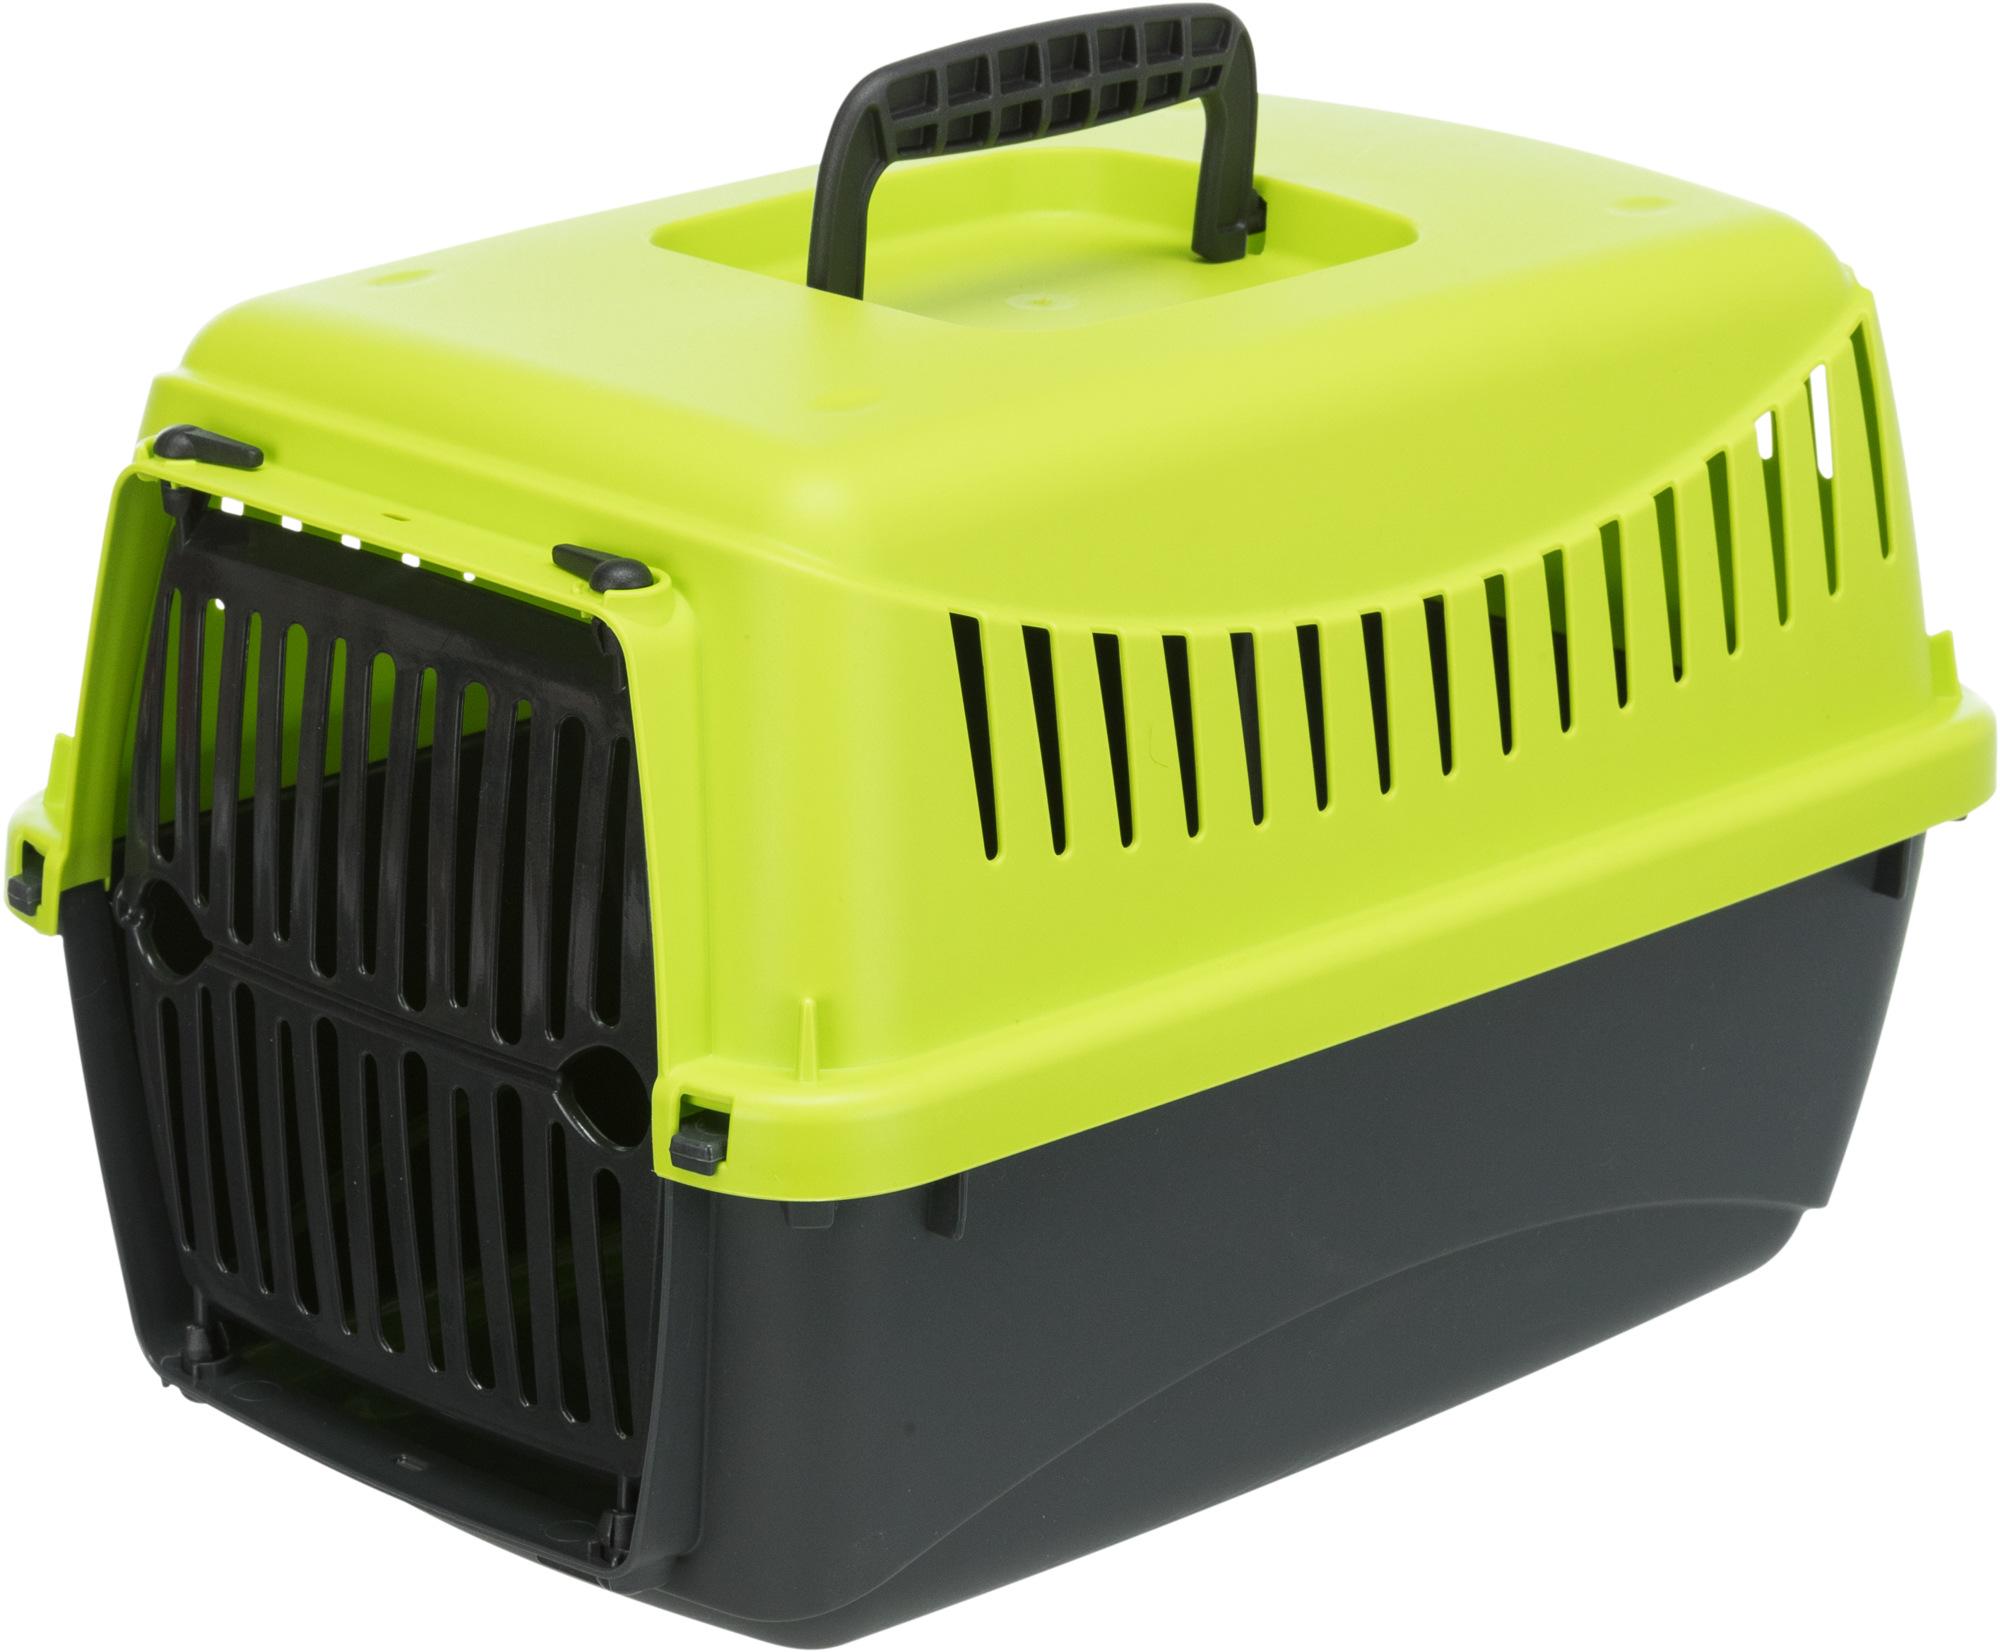 TRIXIE Transportbox Capri XS, XS: 26 × 25 × 39 cm, anthrazit/grün